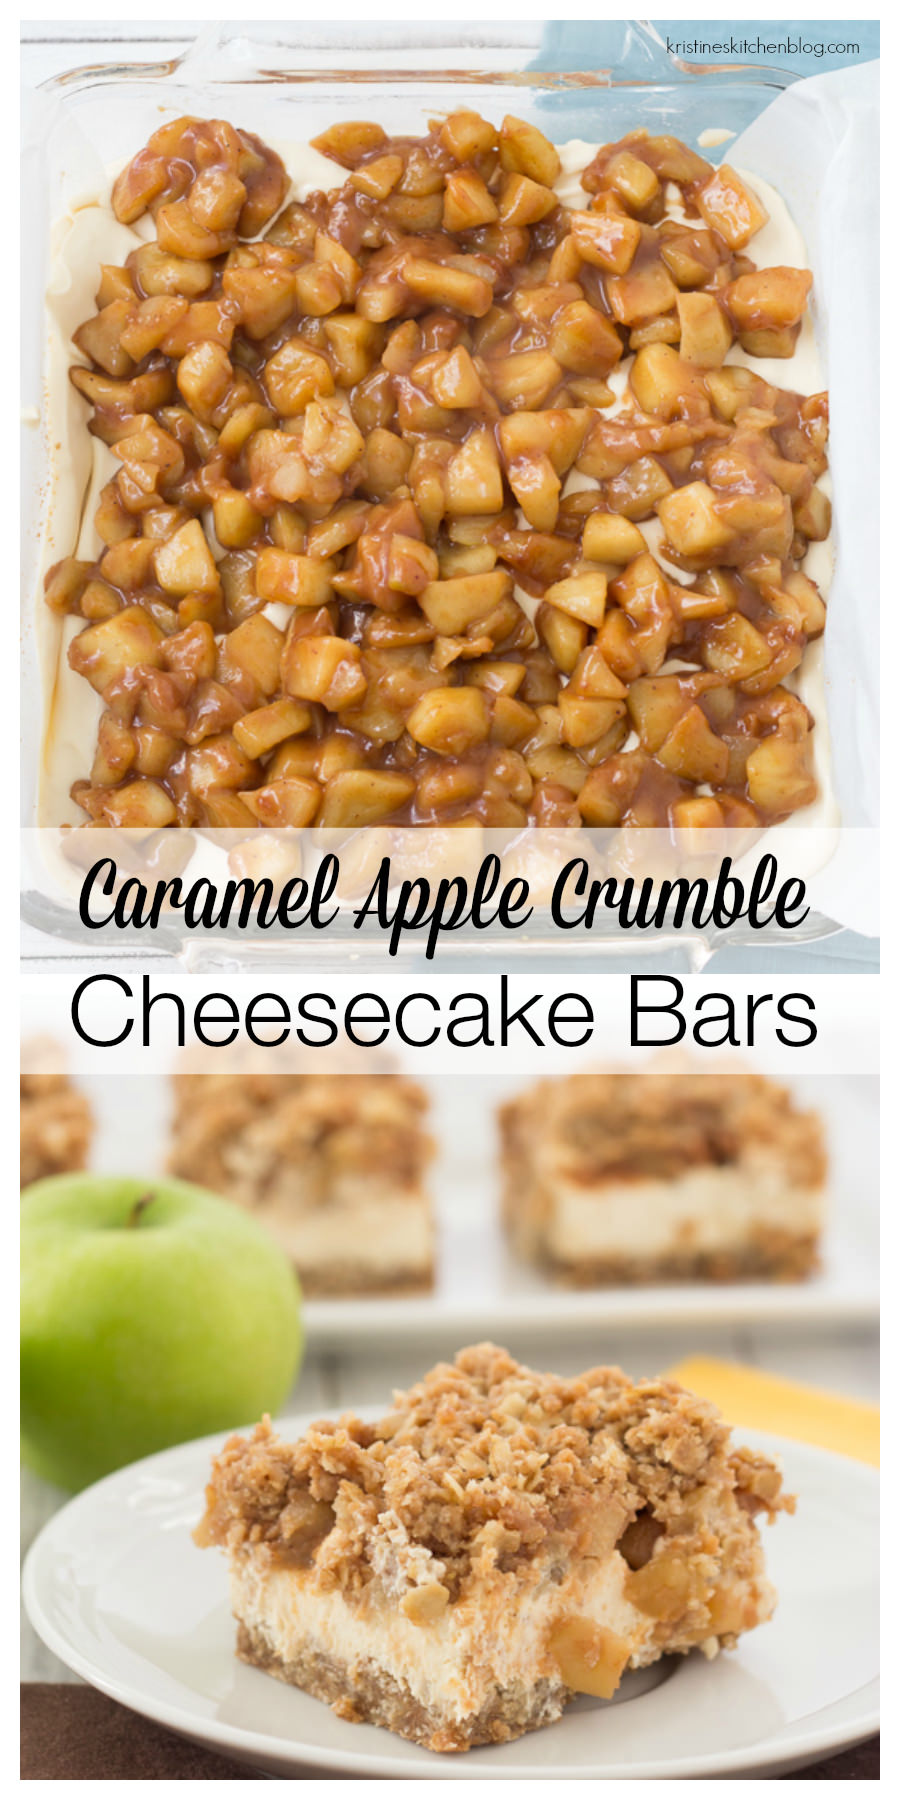 A caramelized oat crust, creamy Greek yogurt cheesecake, caramel apples, and crumb topping. Gluten-free.